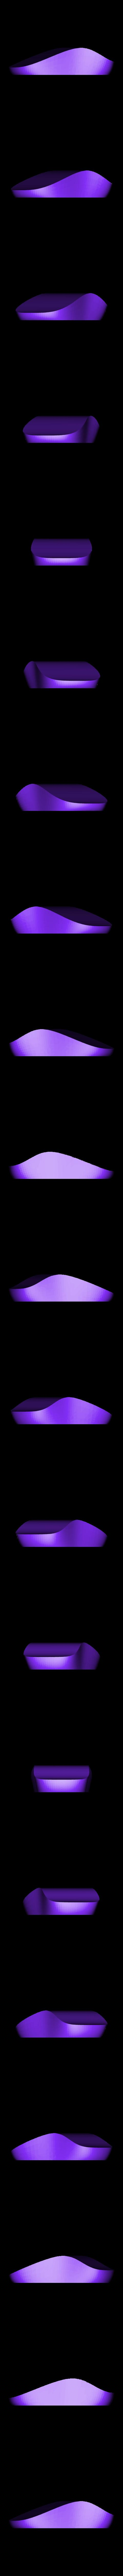 V1_mouse_bottom.STL Download free STL file Multi-Color Computer Mouse Model: Industrial/Product Design • 3D printable model, MosaicManufacturing